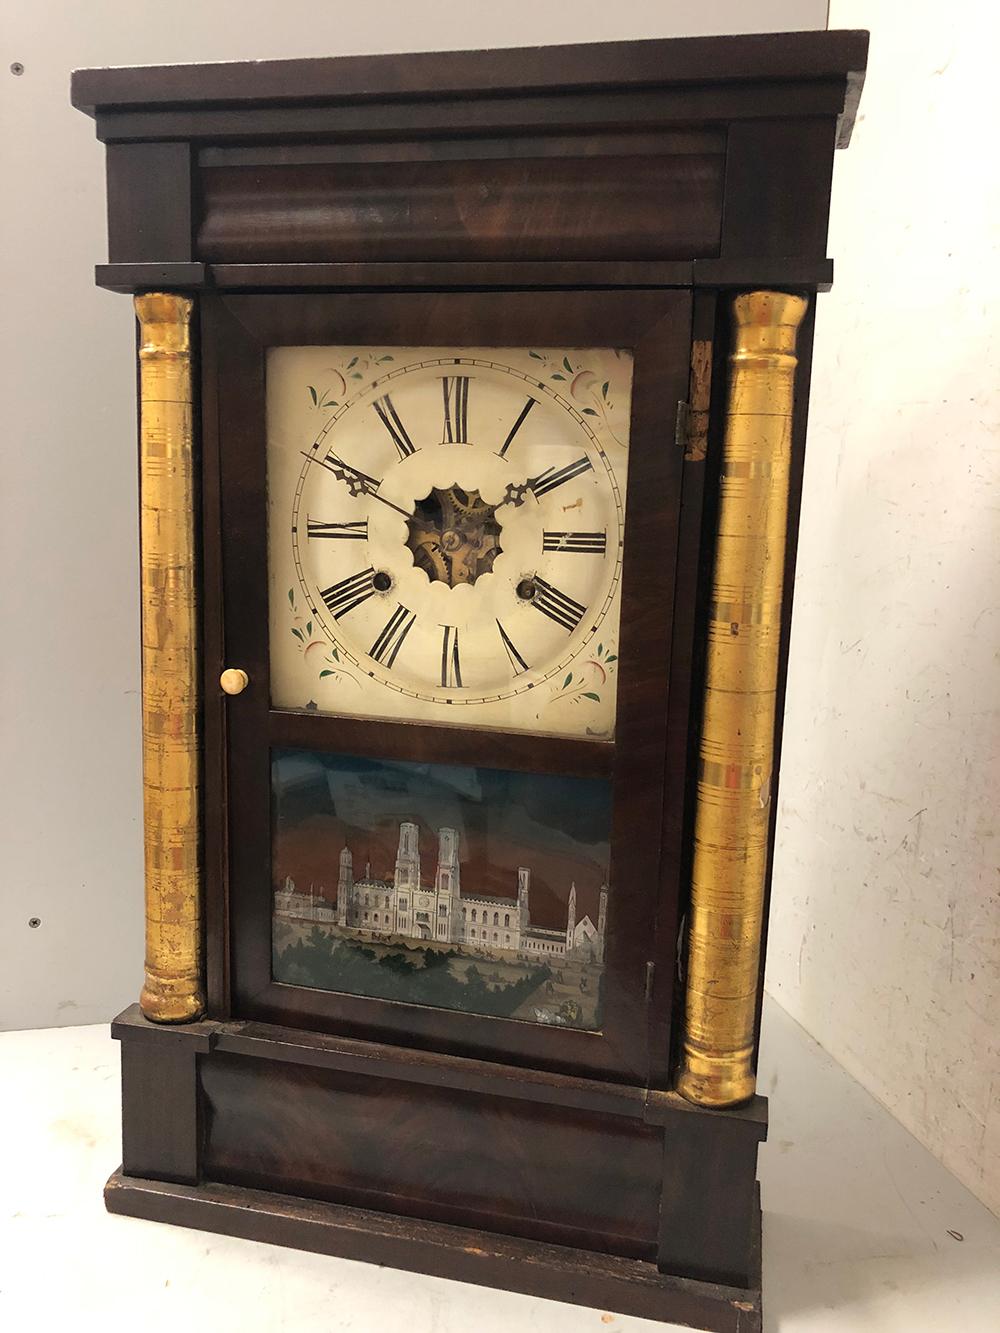 E.N. Welch Shelf Clock